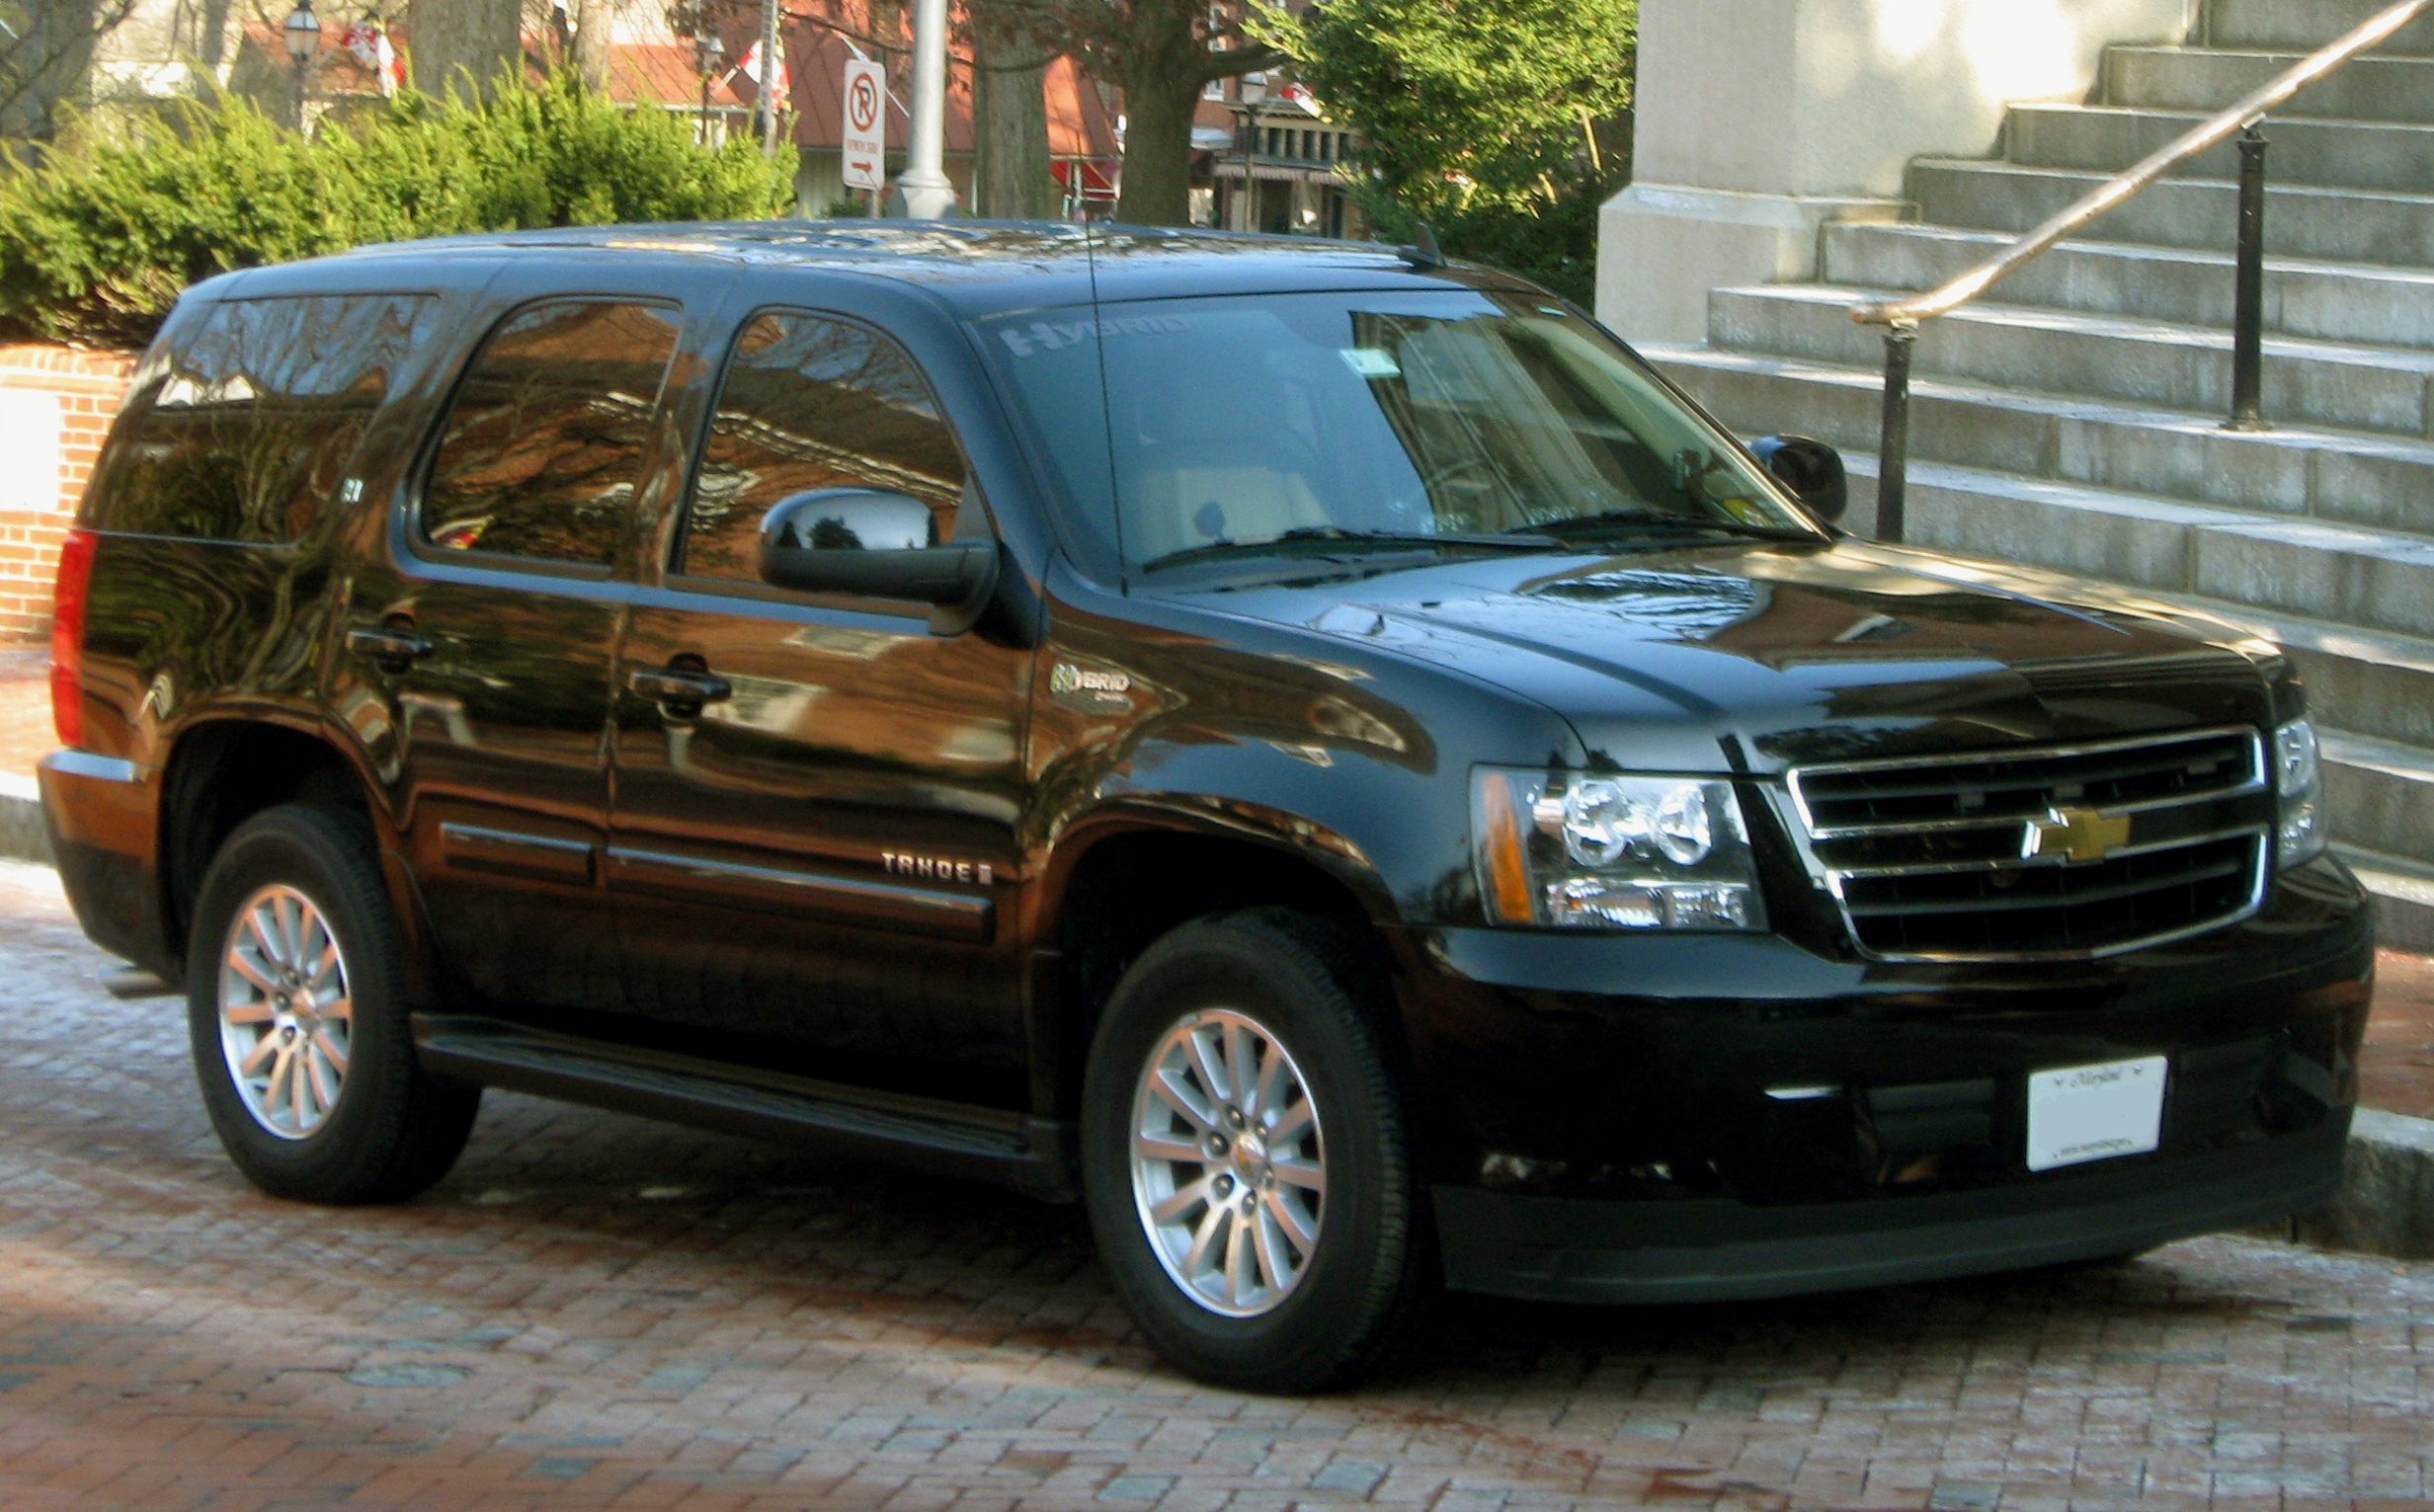 File:Chevrolet Tahoe Hybrid O'Malley -- 01-12-2010.jpg ...